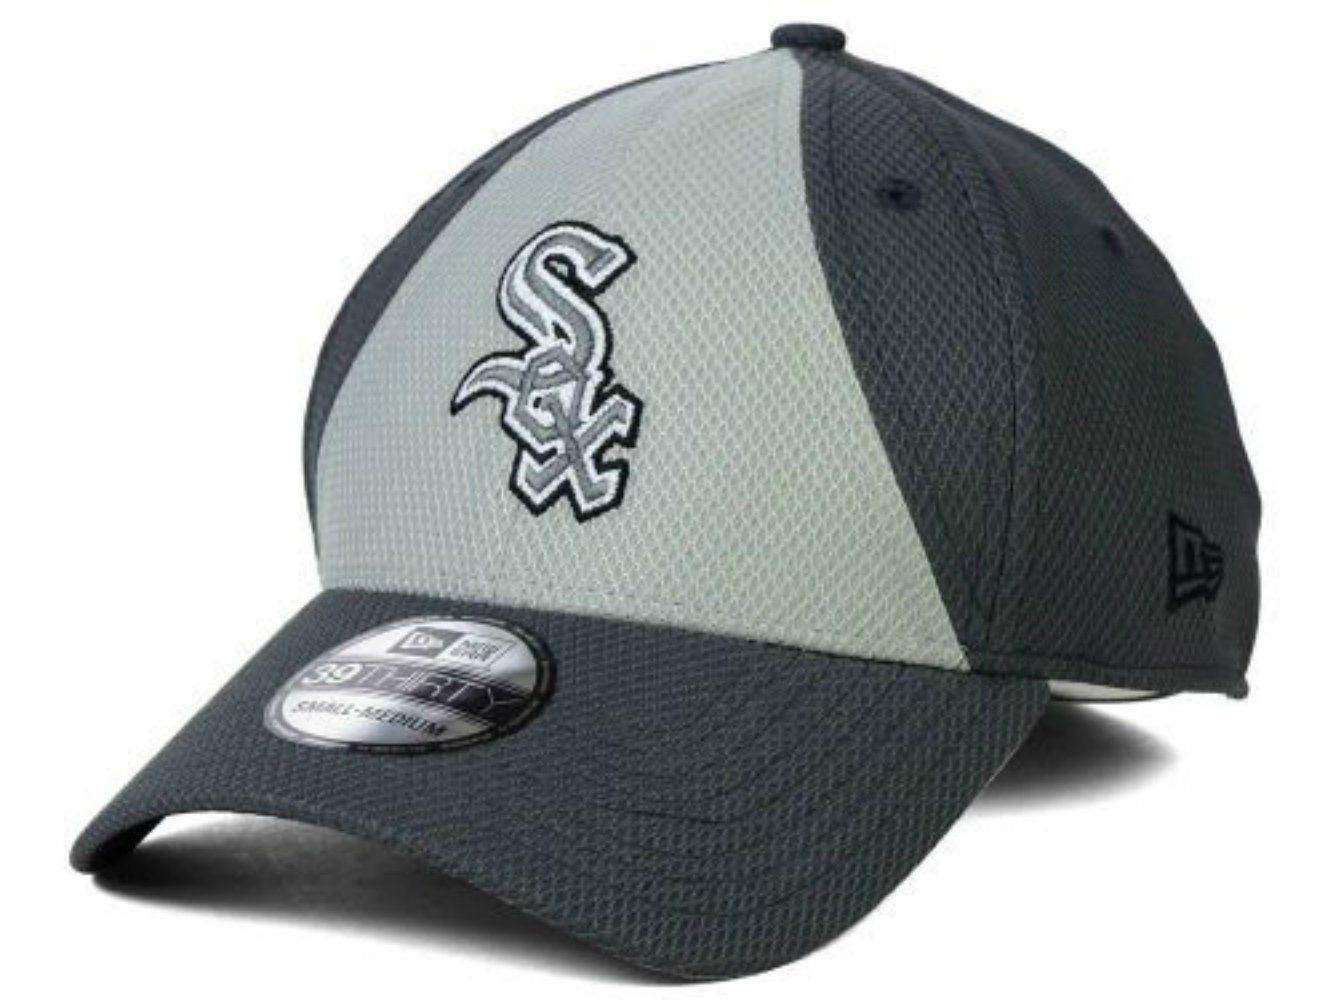 583a6cd0df7 Chicago White Sox New Era Size Small Medium Flex Fit Charcoal Gray Hat Cap -